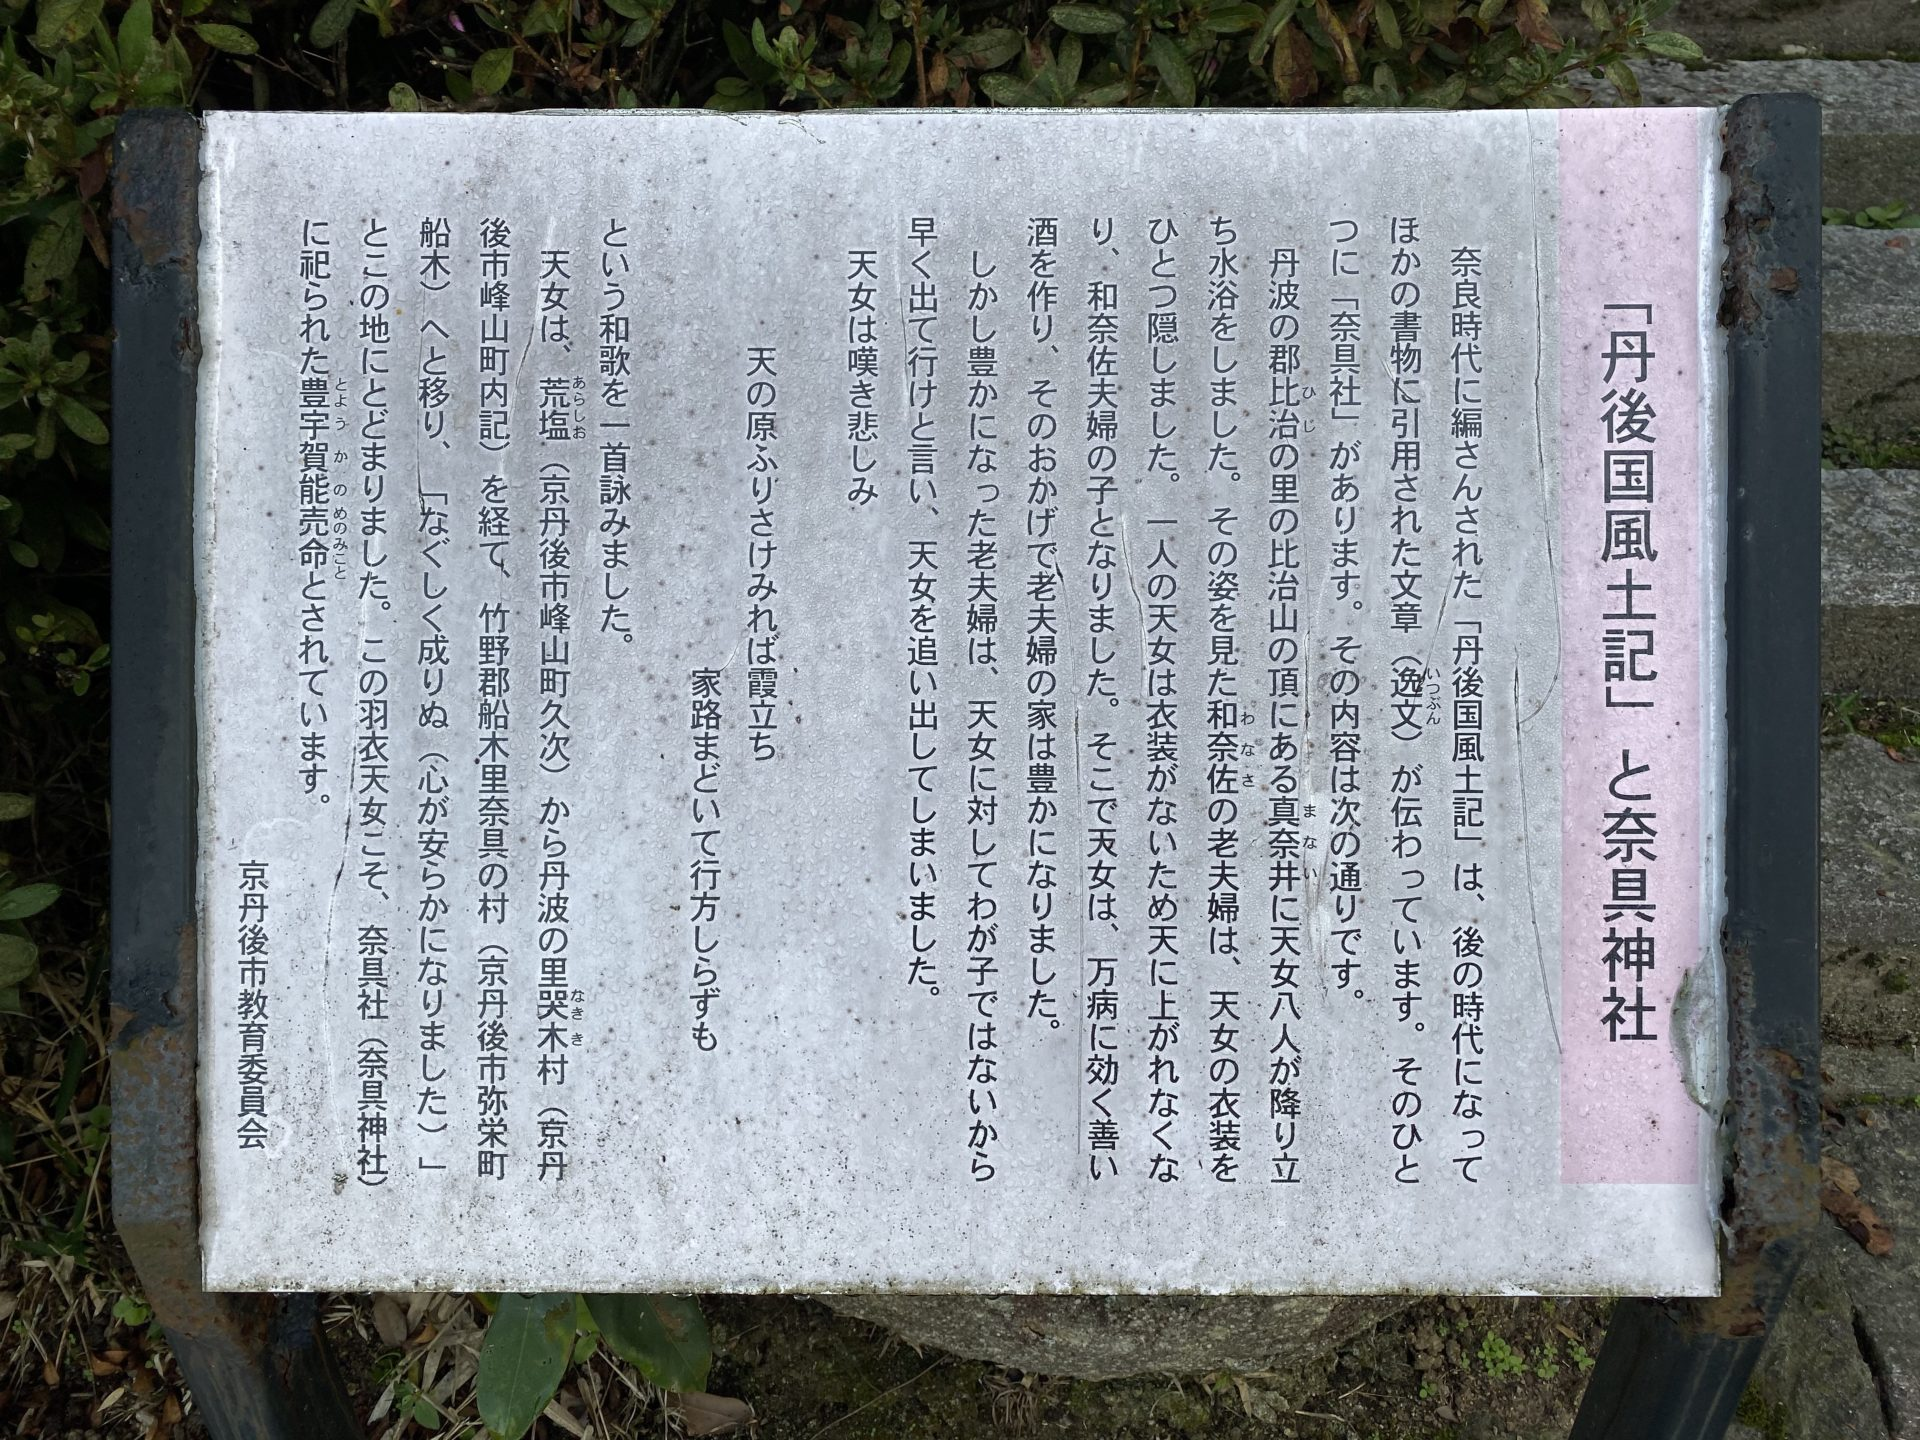 丹後国風土記と奈具神社